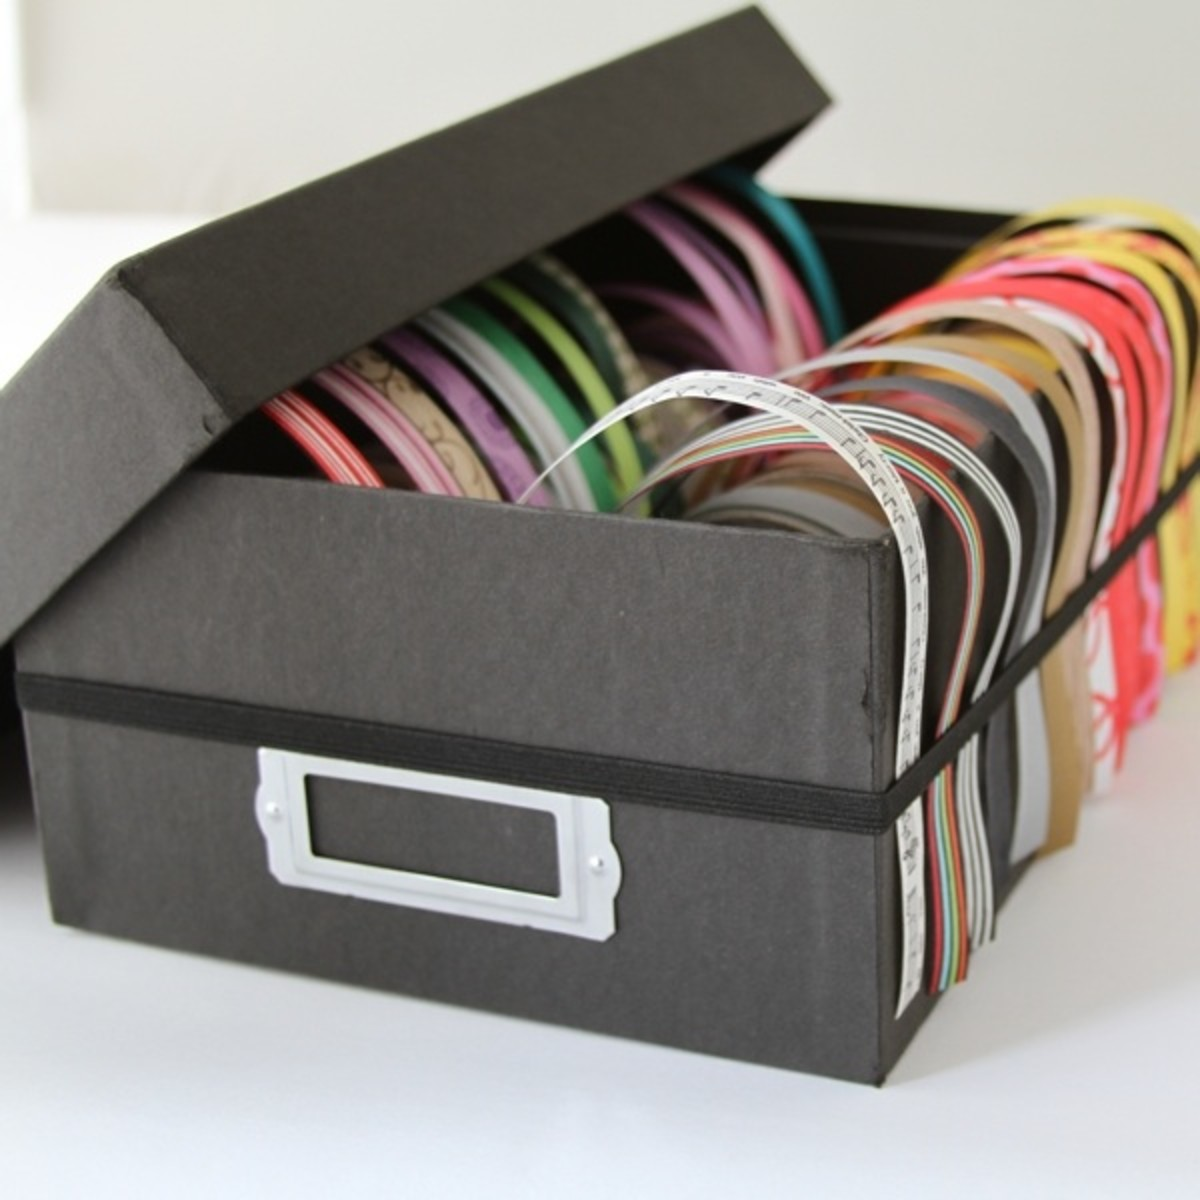 A simple ribbon photo box storage idea